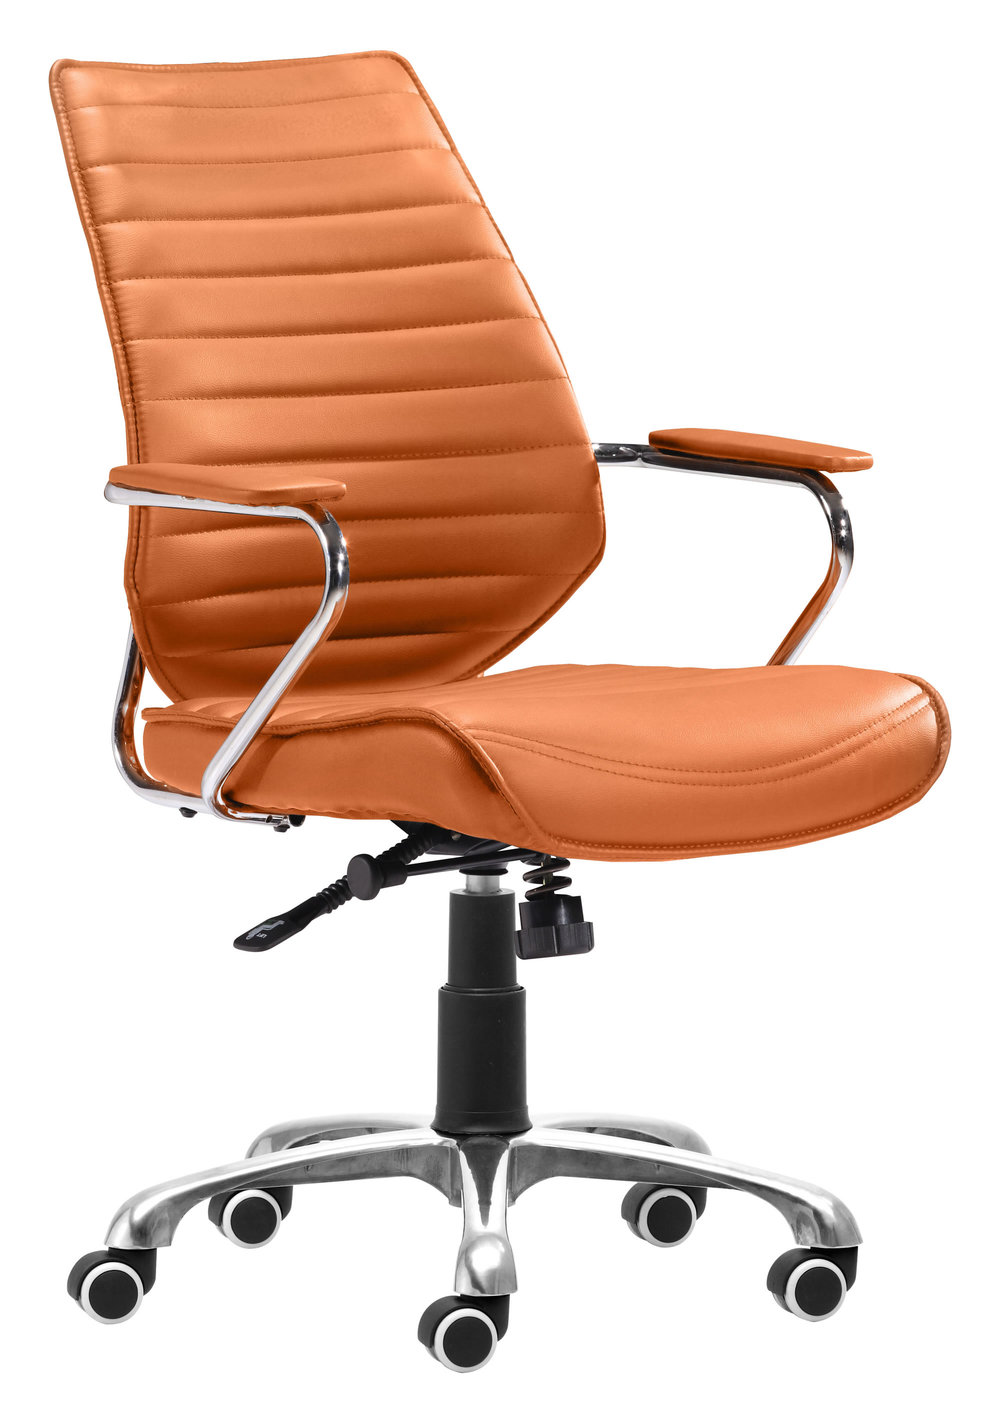 Zuo Modern Contemporary - Enterprise Low Back Office Chair Terracotta